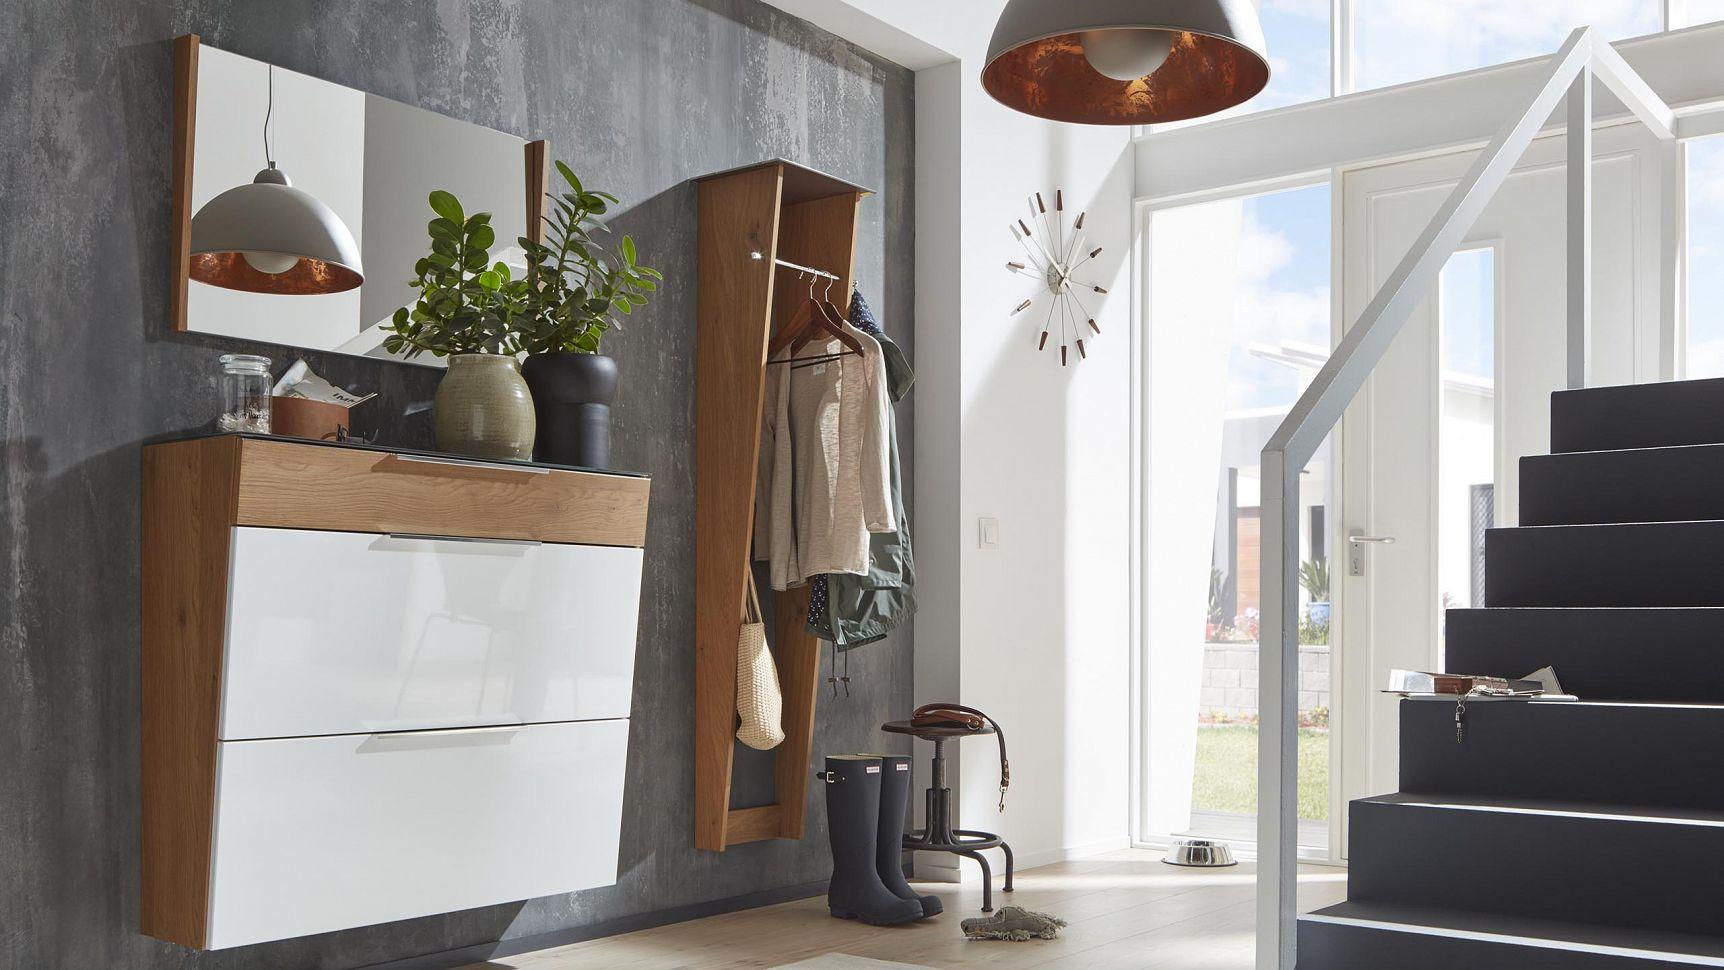 Interliving Garderoben Serie 6001 Image